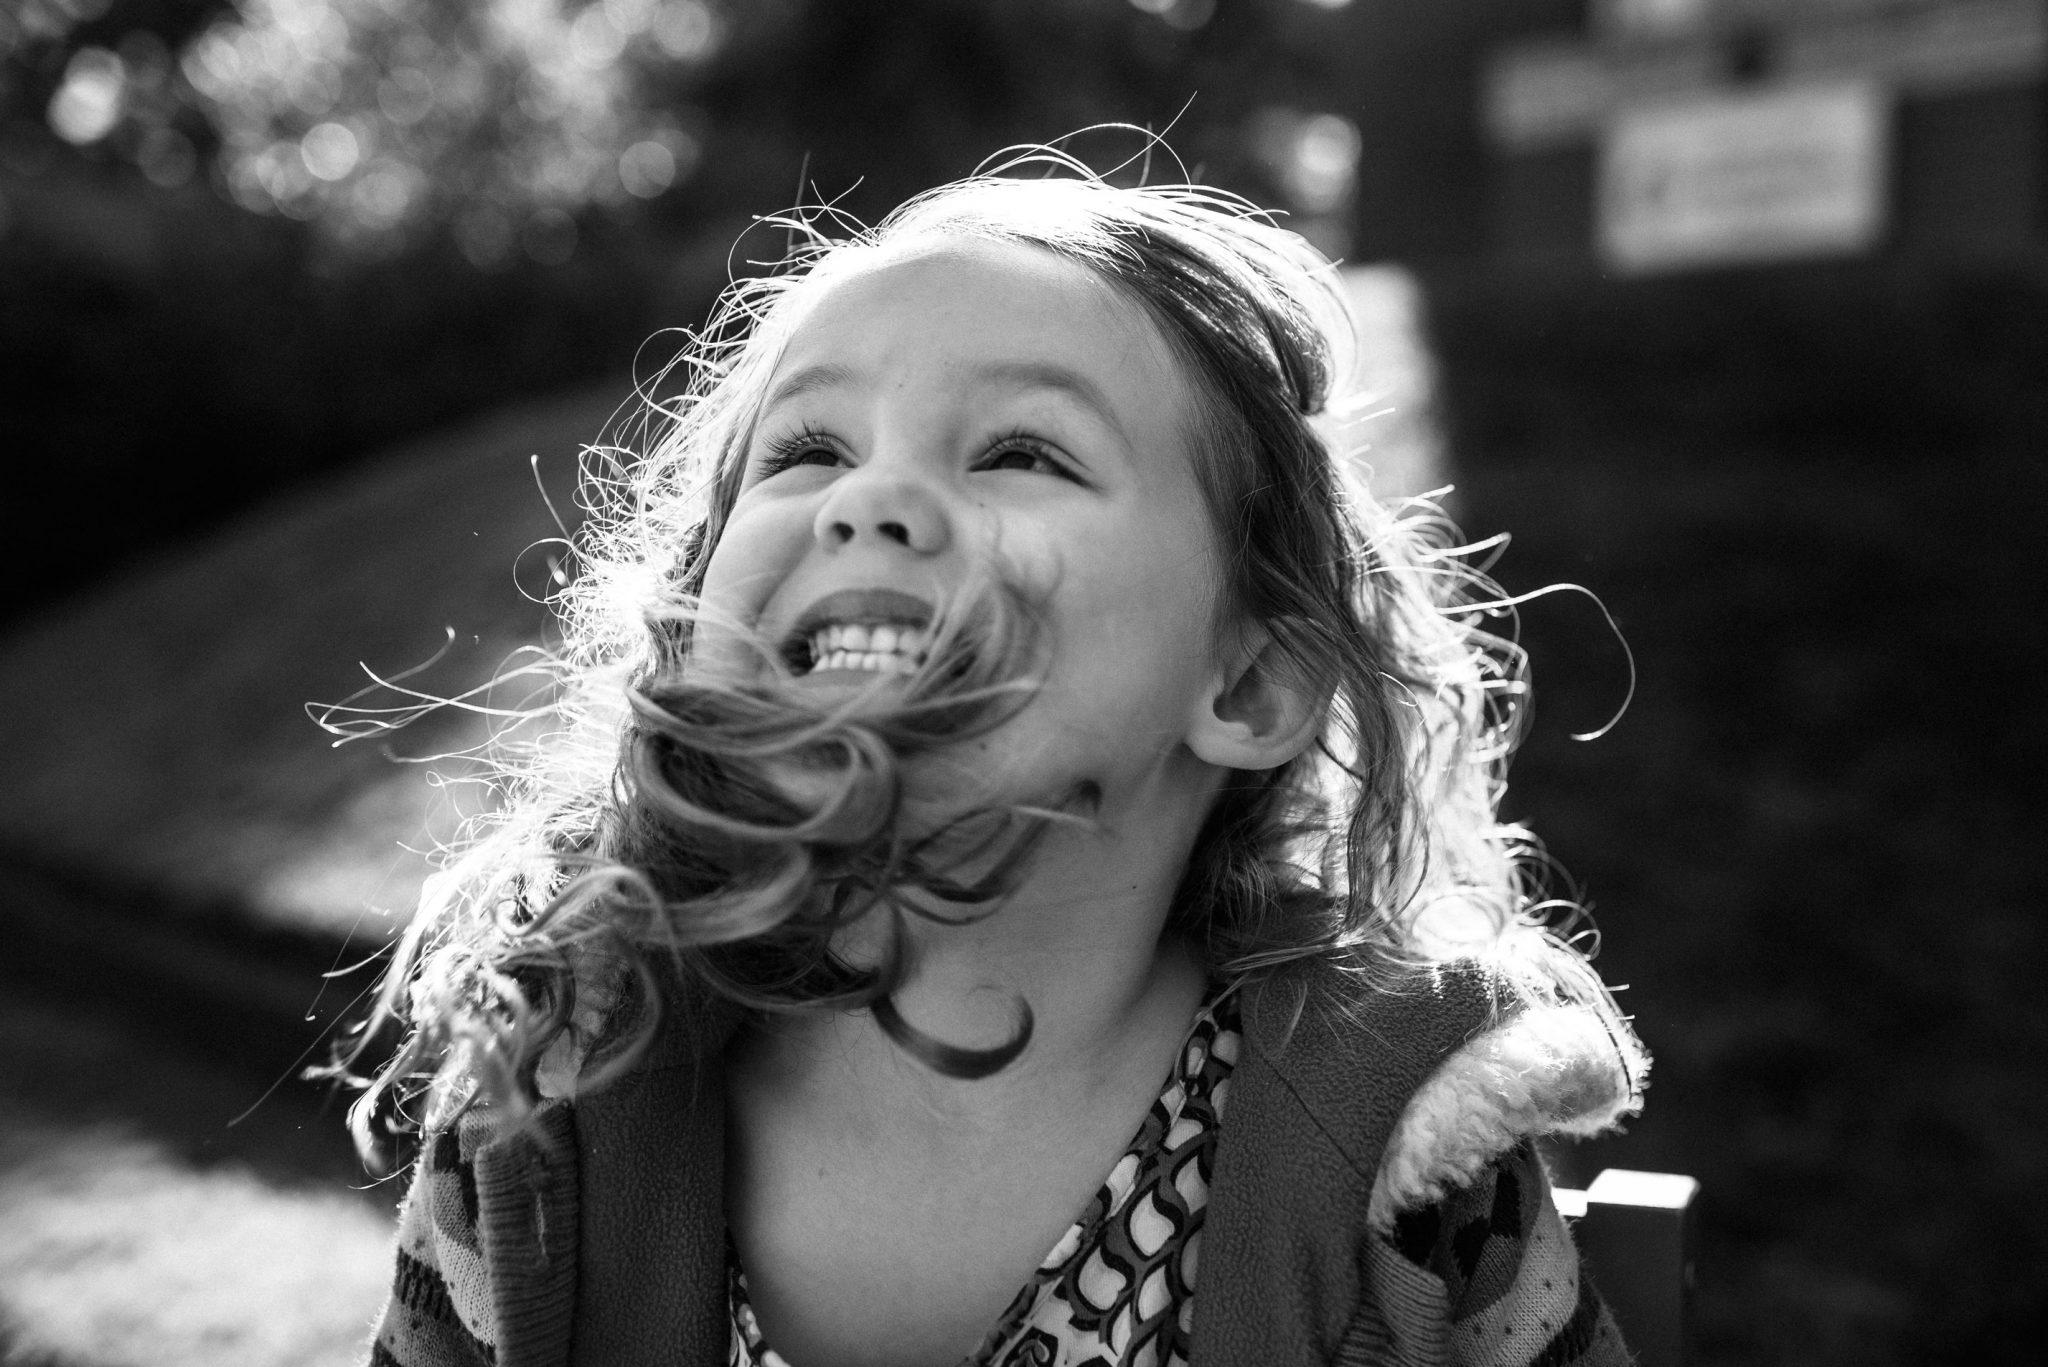 Montessori Preschool Portraits   Spokane Photographer   Not Your Average Preschool Portrait